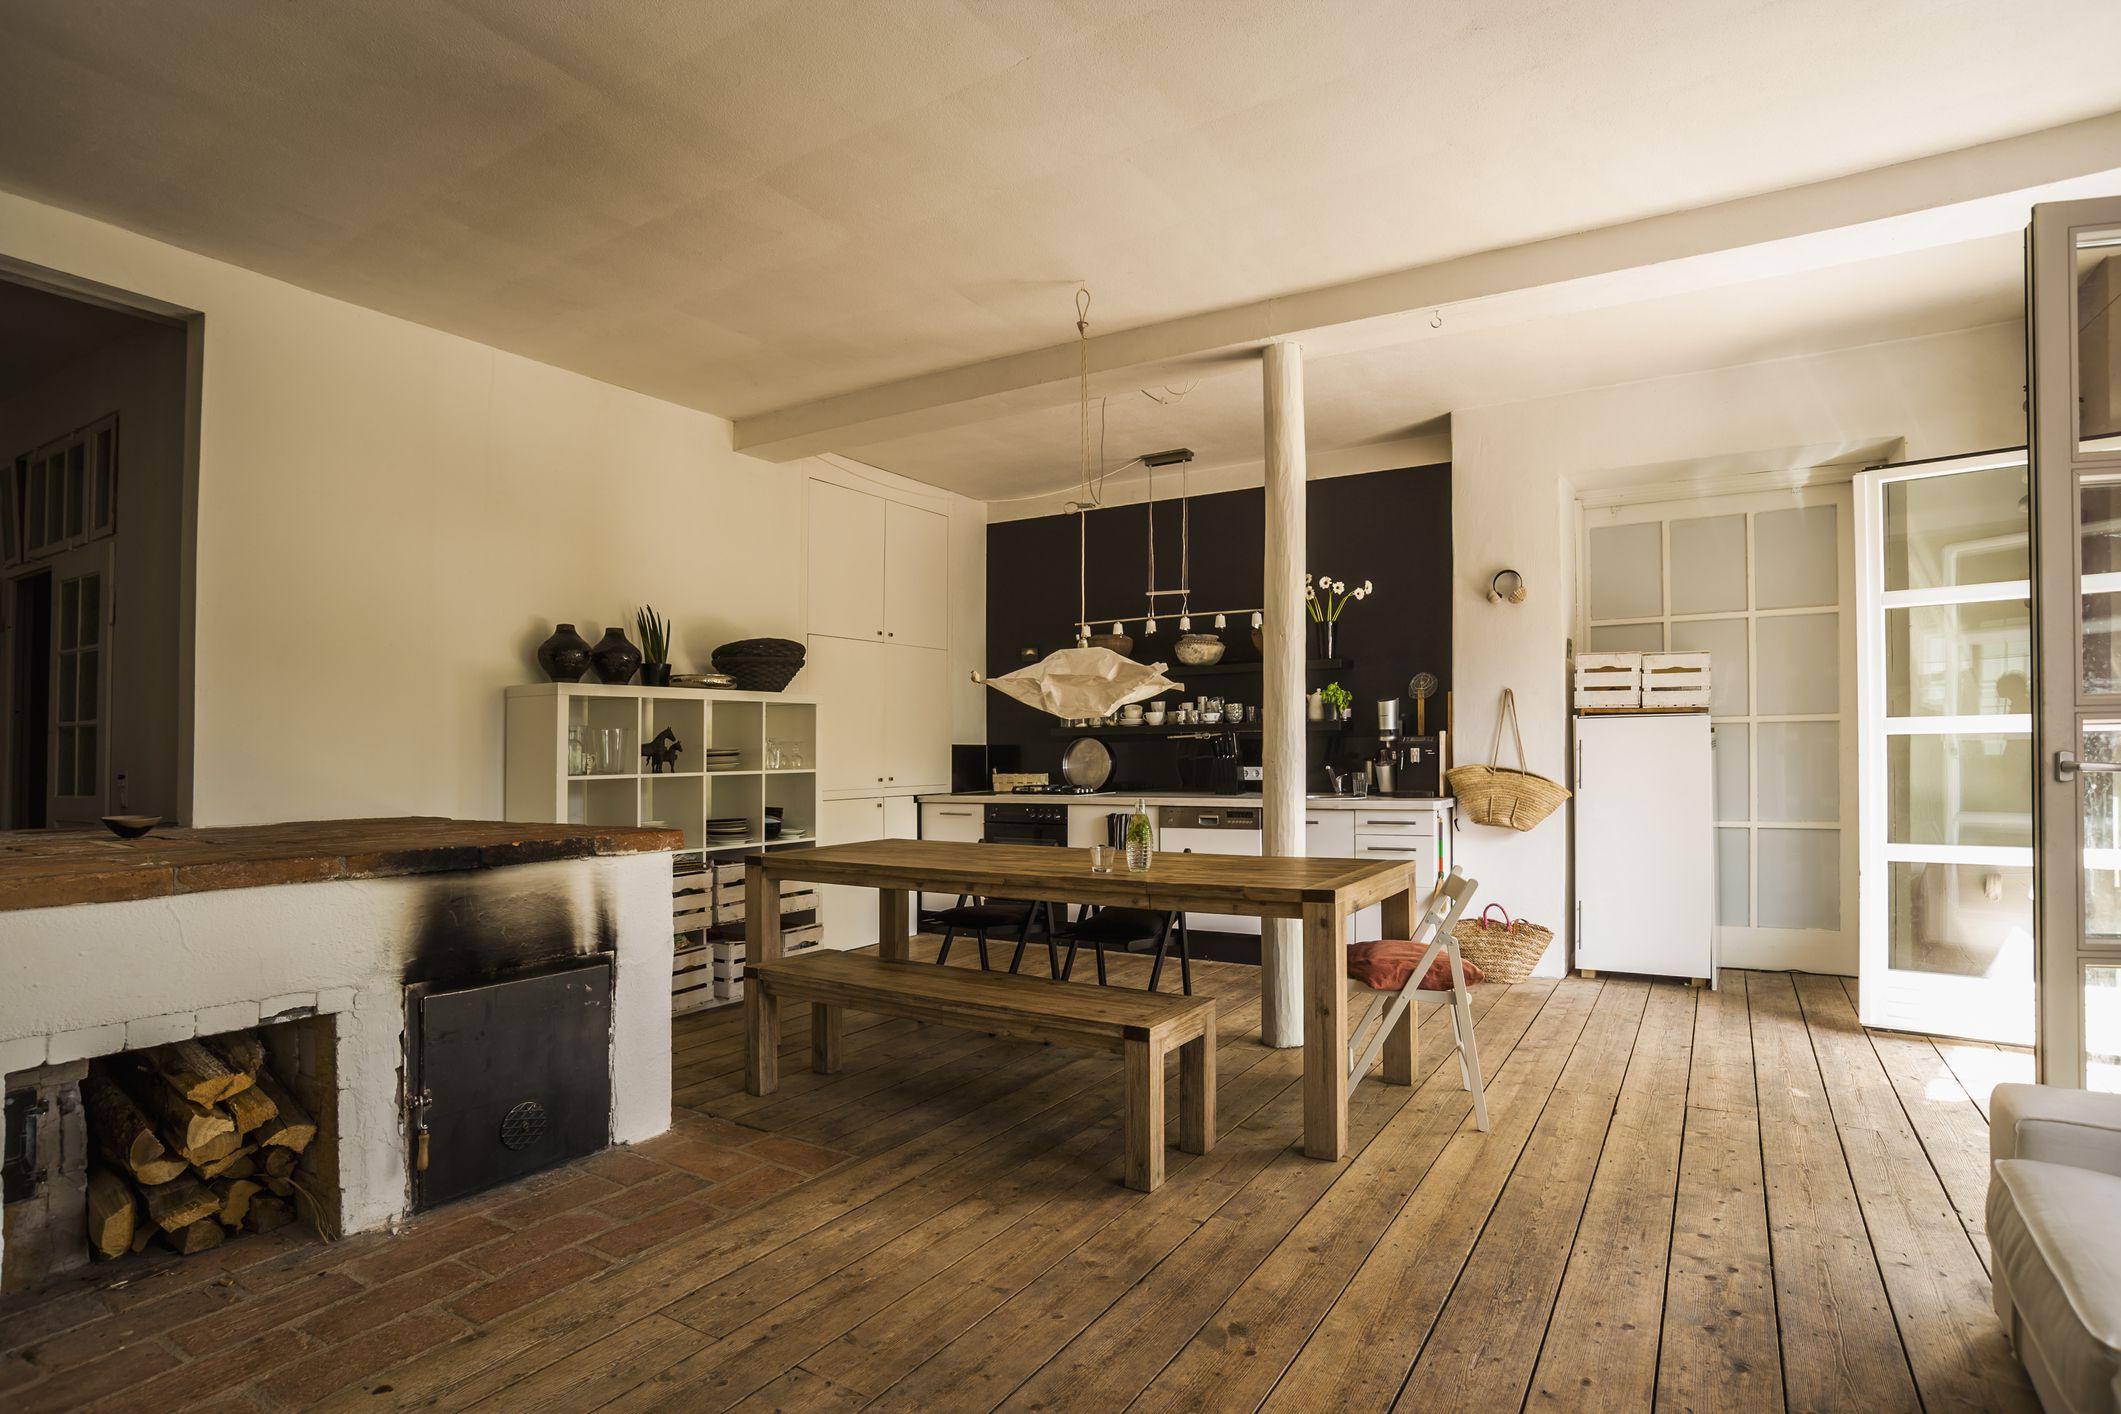 redo hardwood floors cheap of vinyl wood flooring versus natural hardwood inside diningroom woodenfloor gettyimages 544546775 590e57565f9b58647043440a